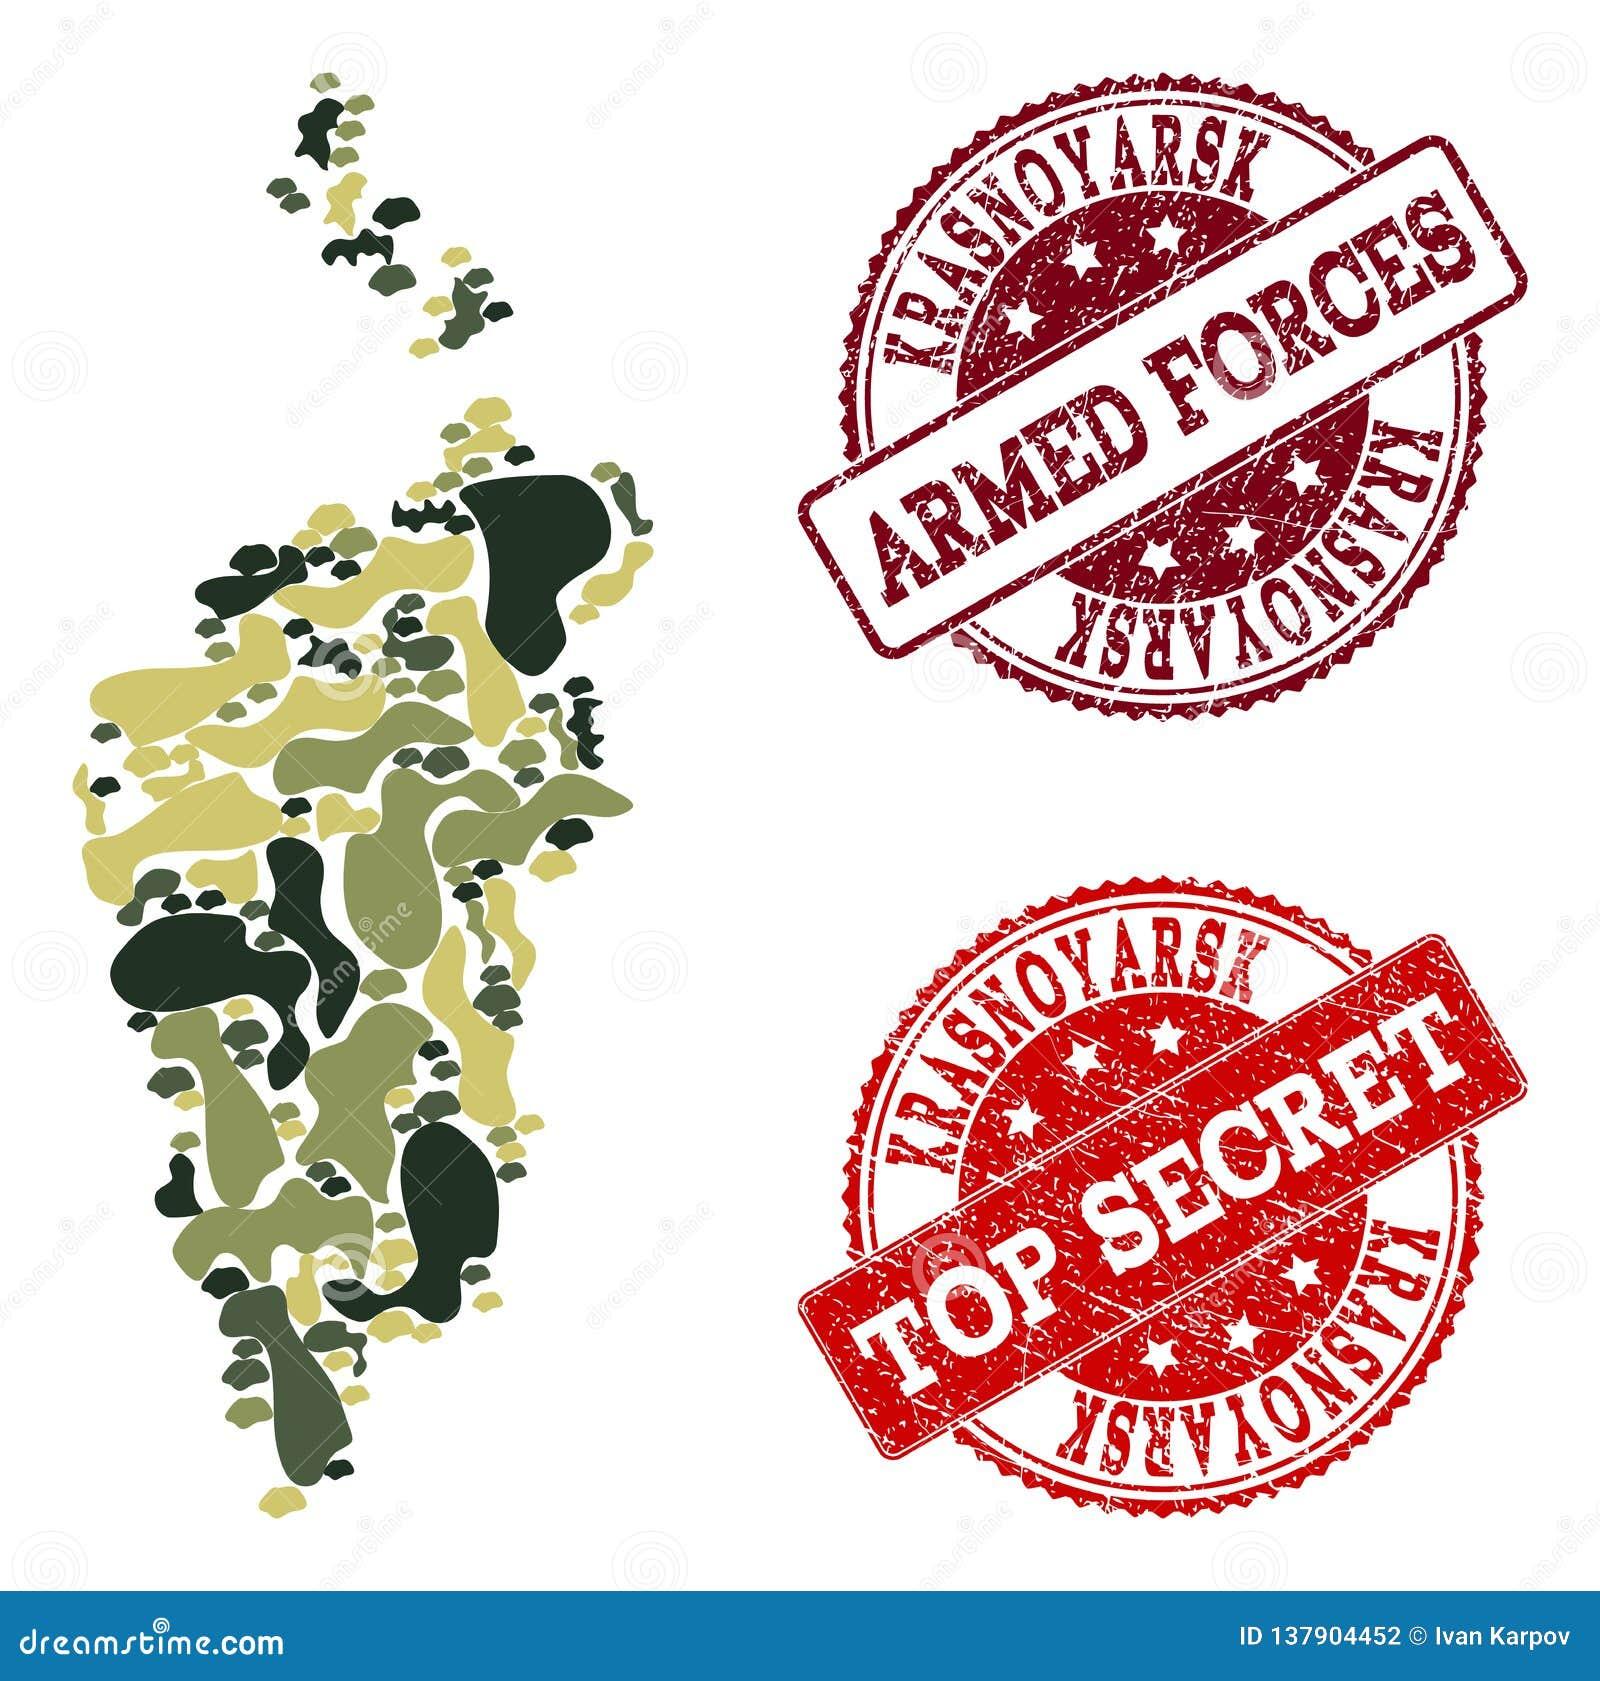 Military Camouflage Collage of Map of Krasnoyarsk Krai and Scratched Secret Stamps